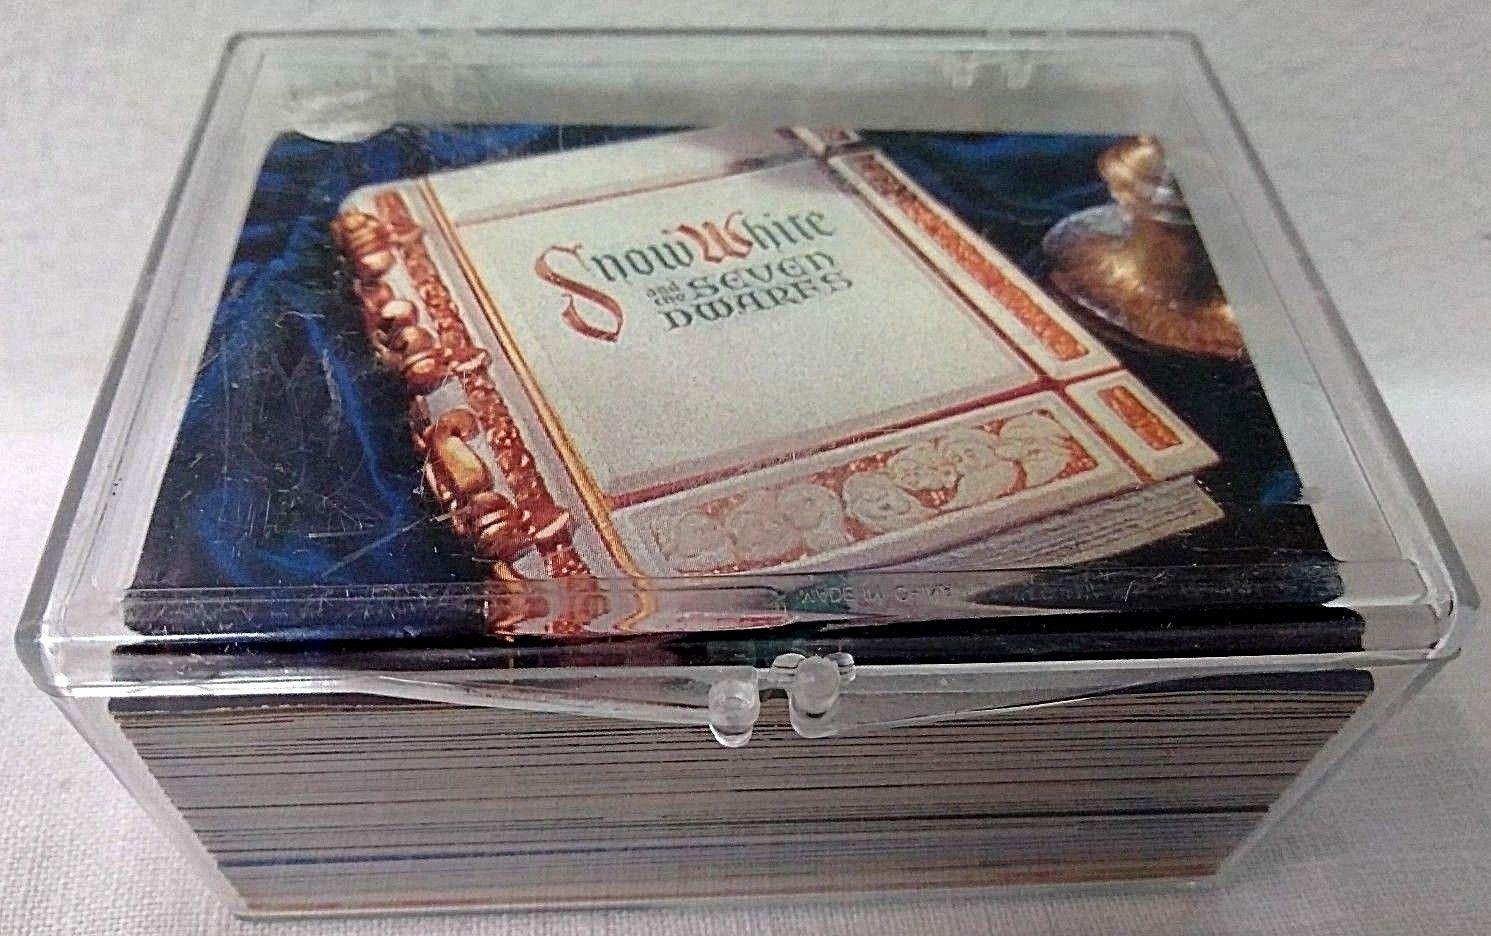 WALT DISNEY'S SNOW WHITE & THE SEVEN DWARFS TRADING CARDS